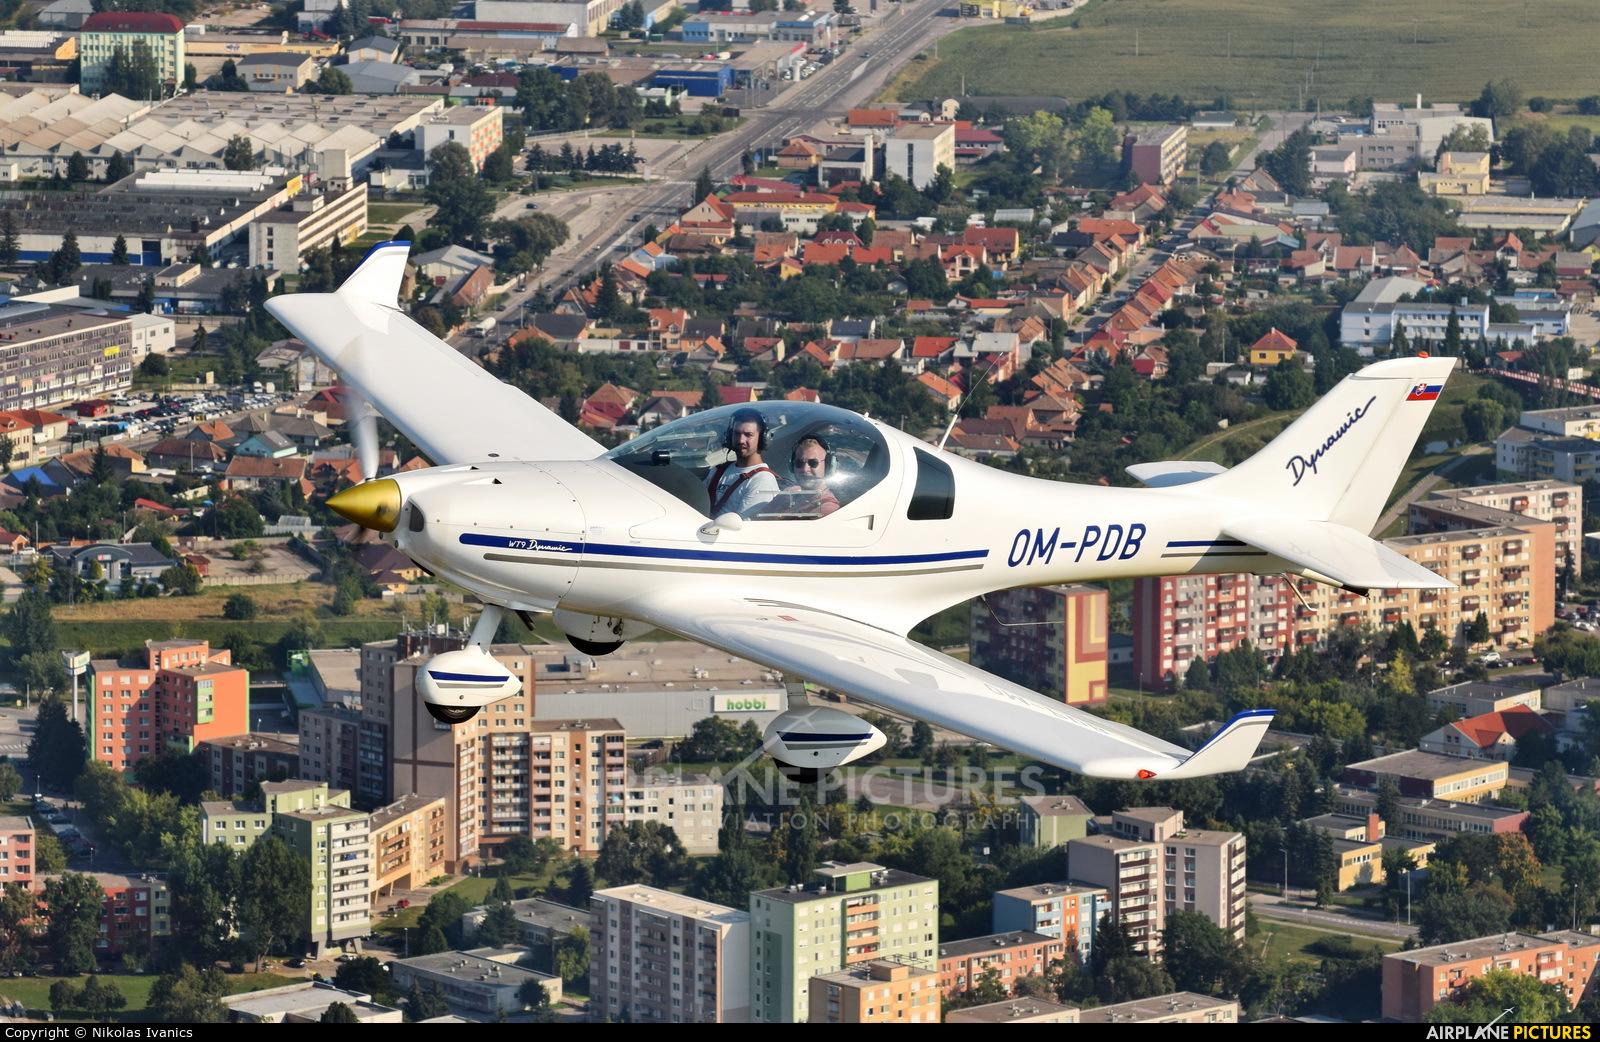 Aeroklub Prievidza OM-PDB aircraft at In Flight - Slovakia